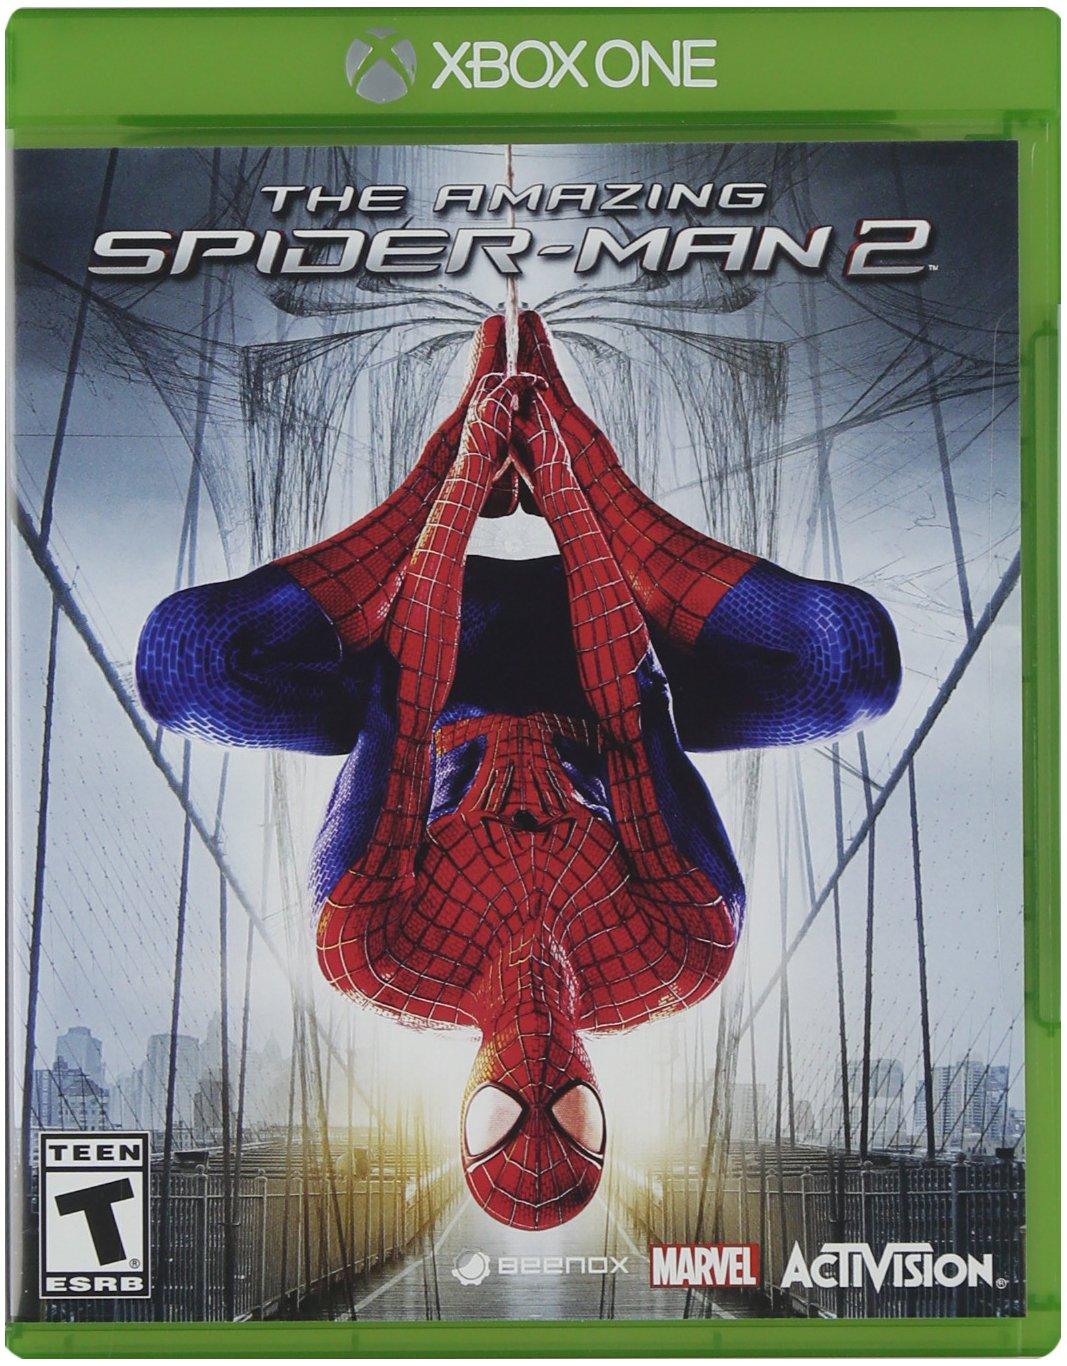 The Amazing Spider-Man 2 - Xbox One